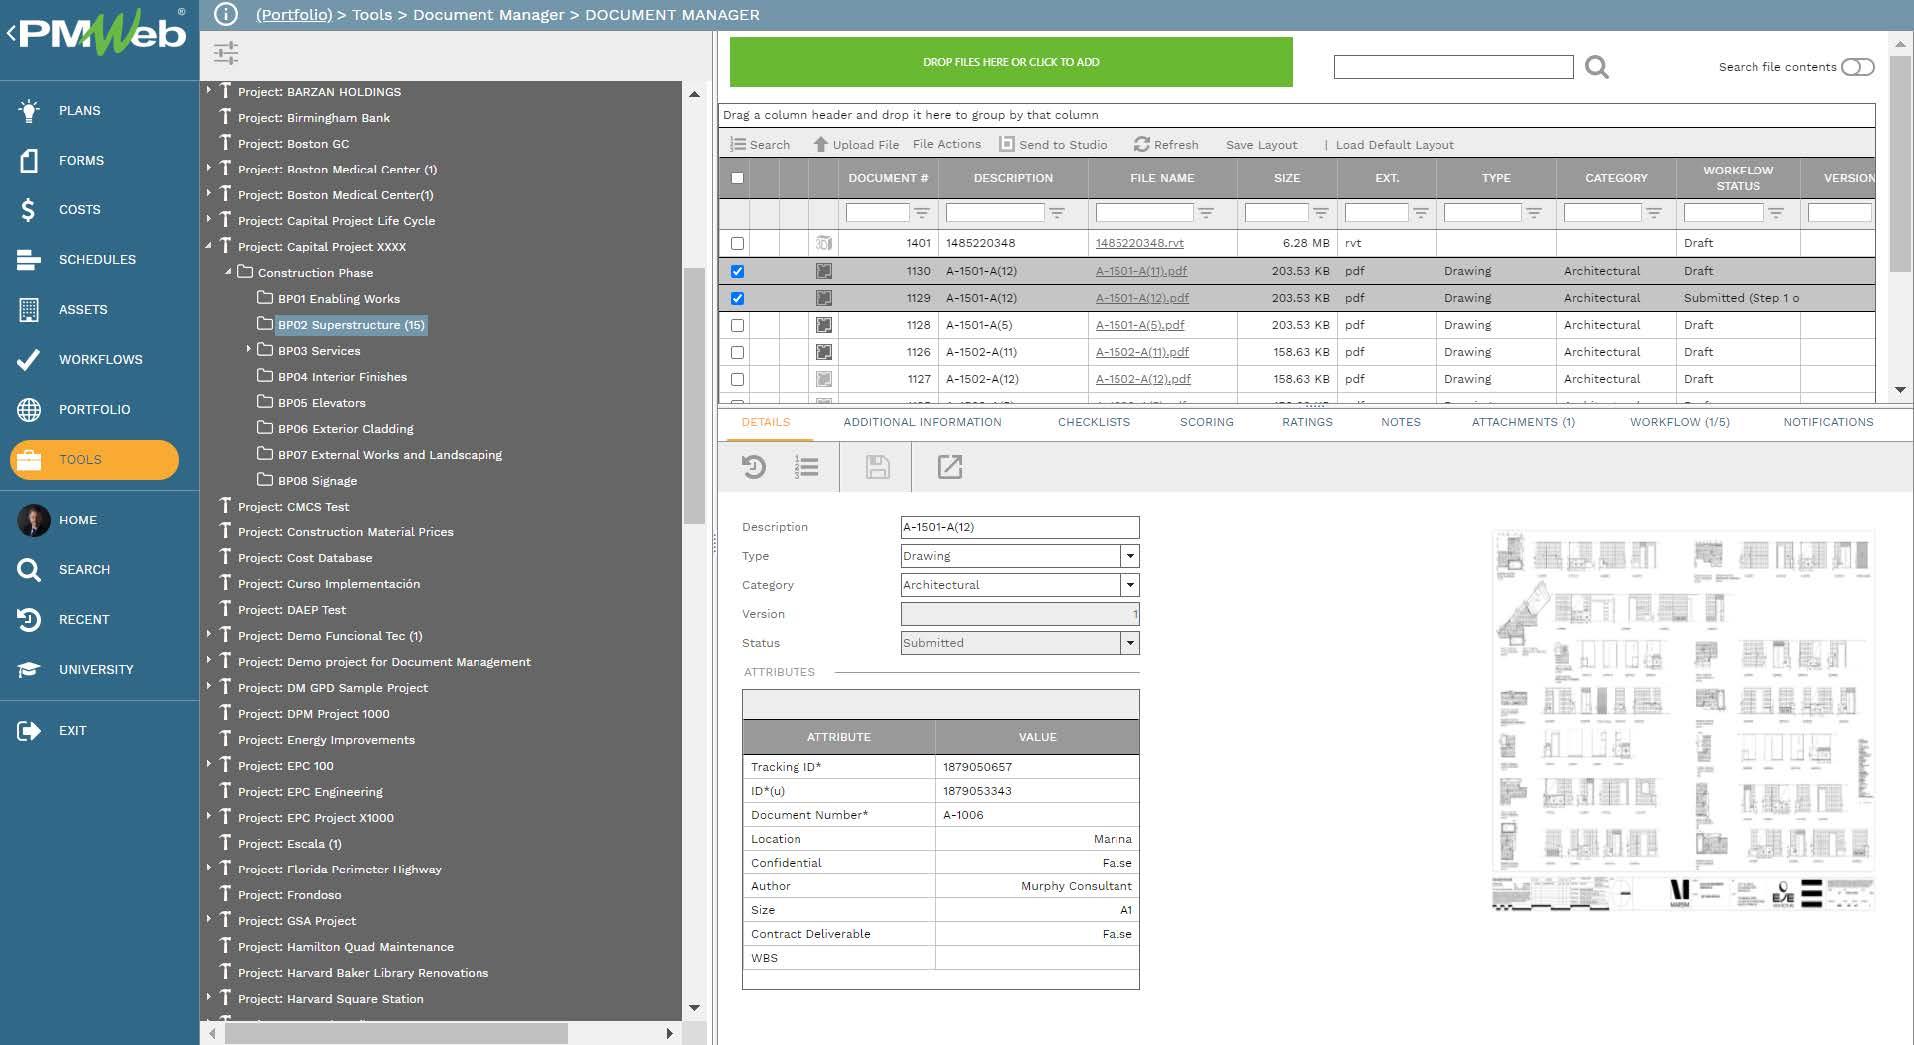 PMWeb 7 Tools Documents Manager